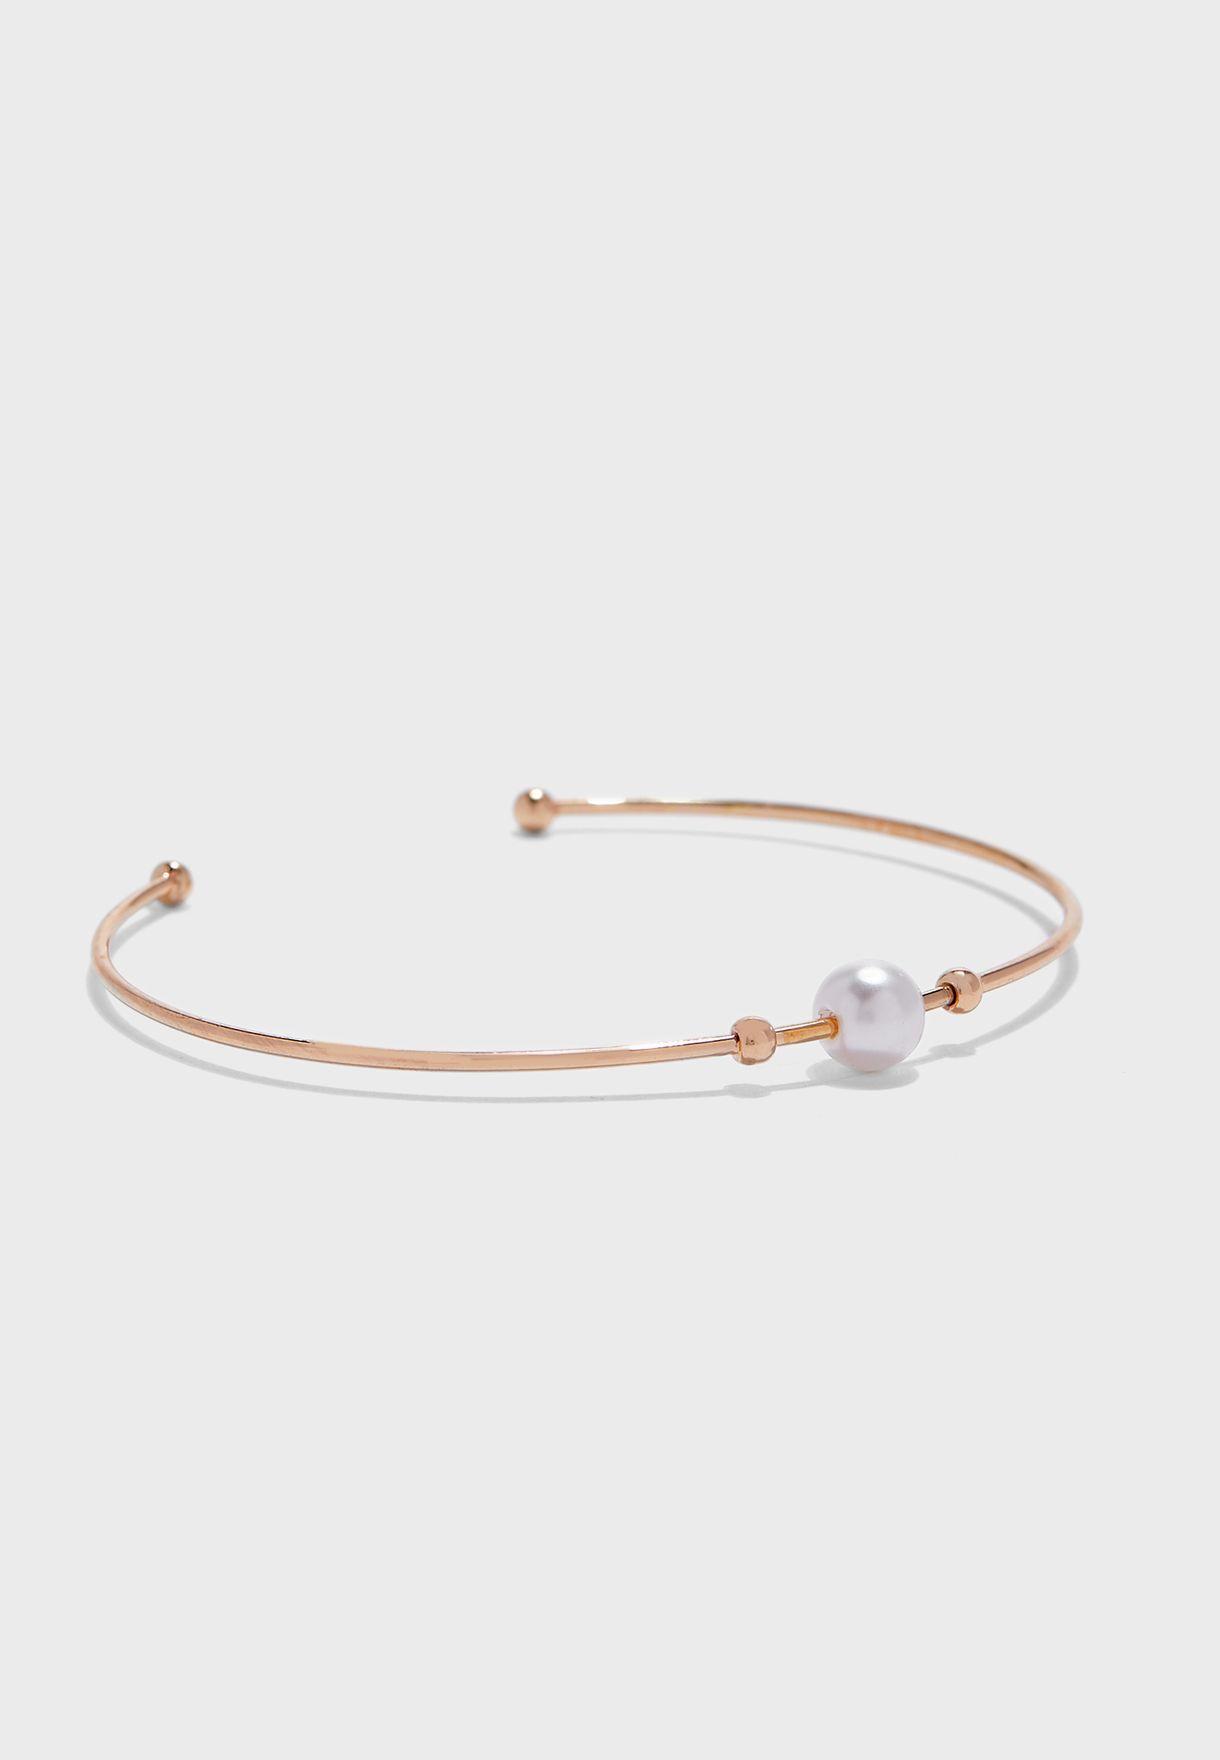 Legiavia Bracelet Set